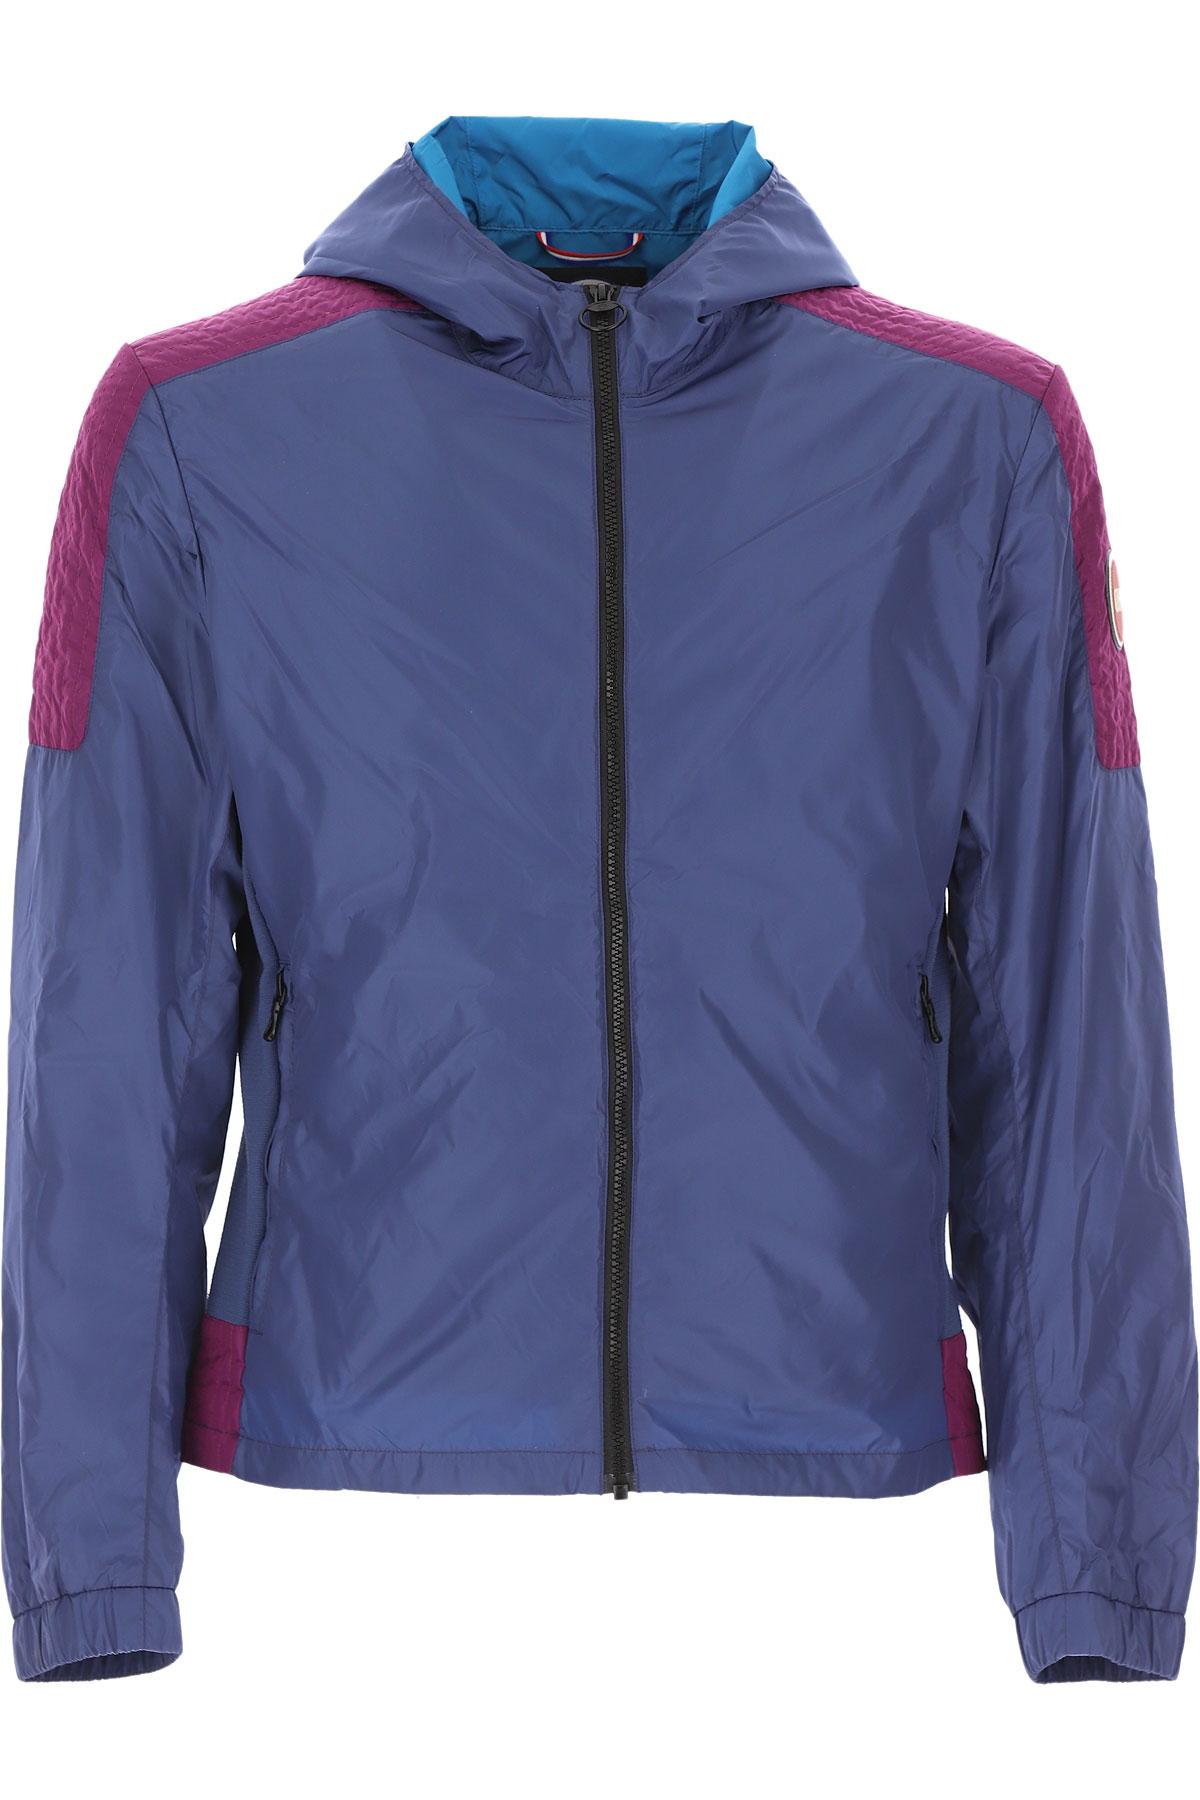 Colmar Jacket for Men On Sale, Avio Blue, polyester, 2019, L XL